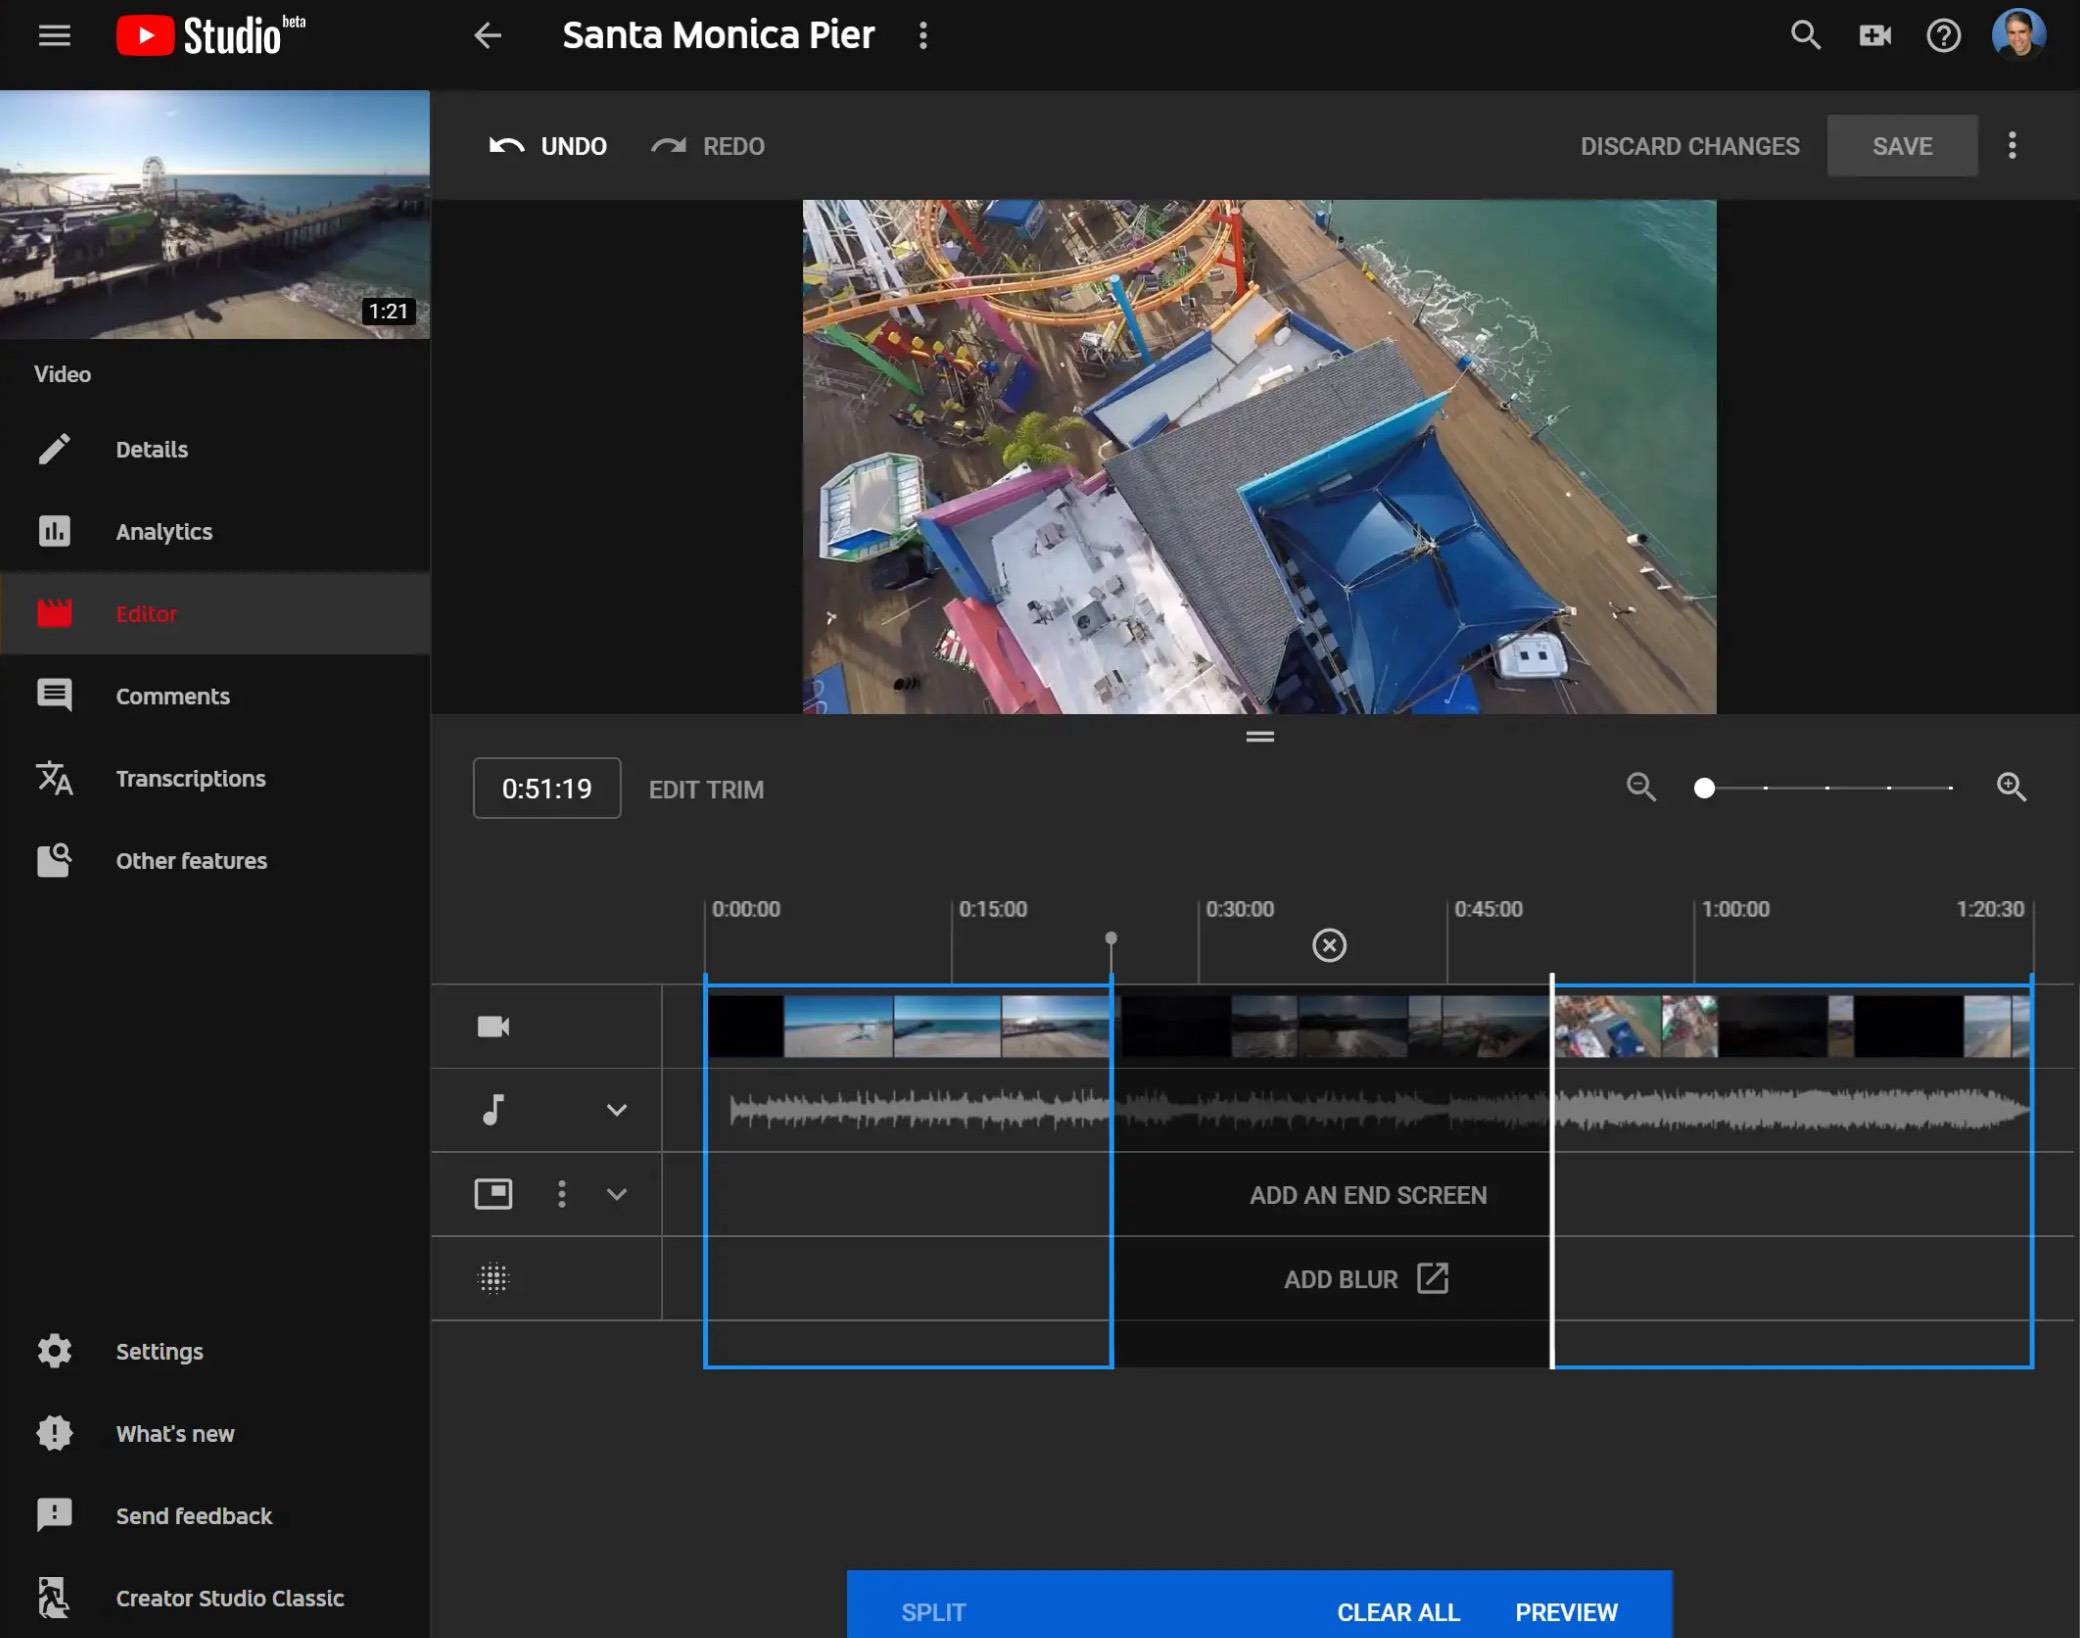 youtube-studio-video-editor image